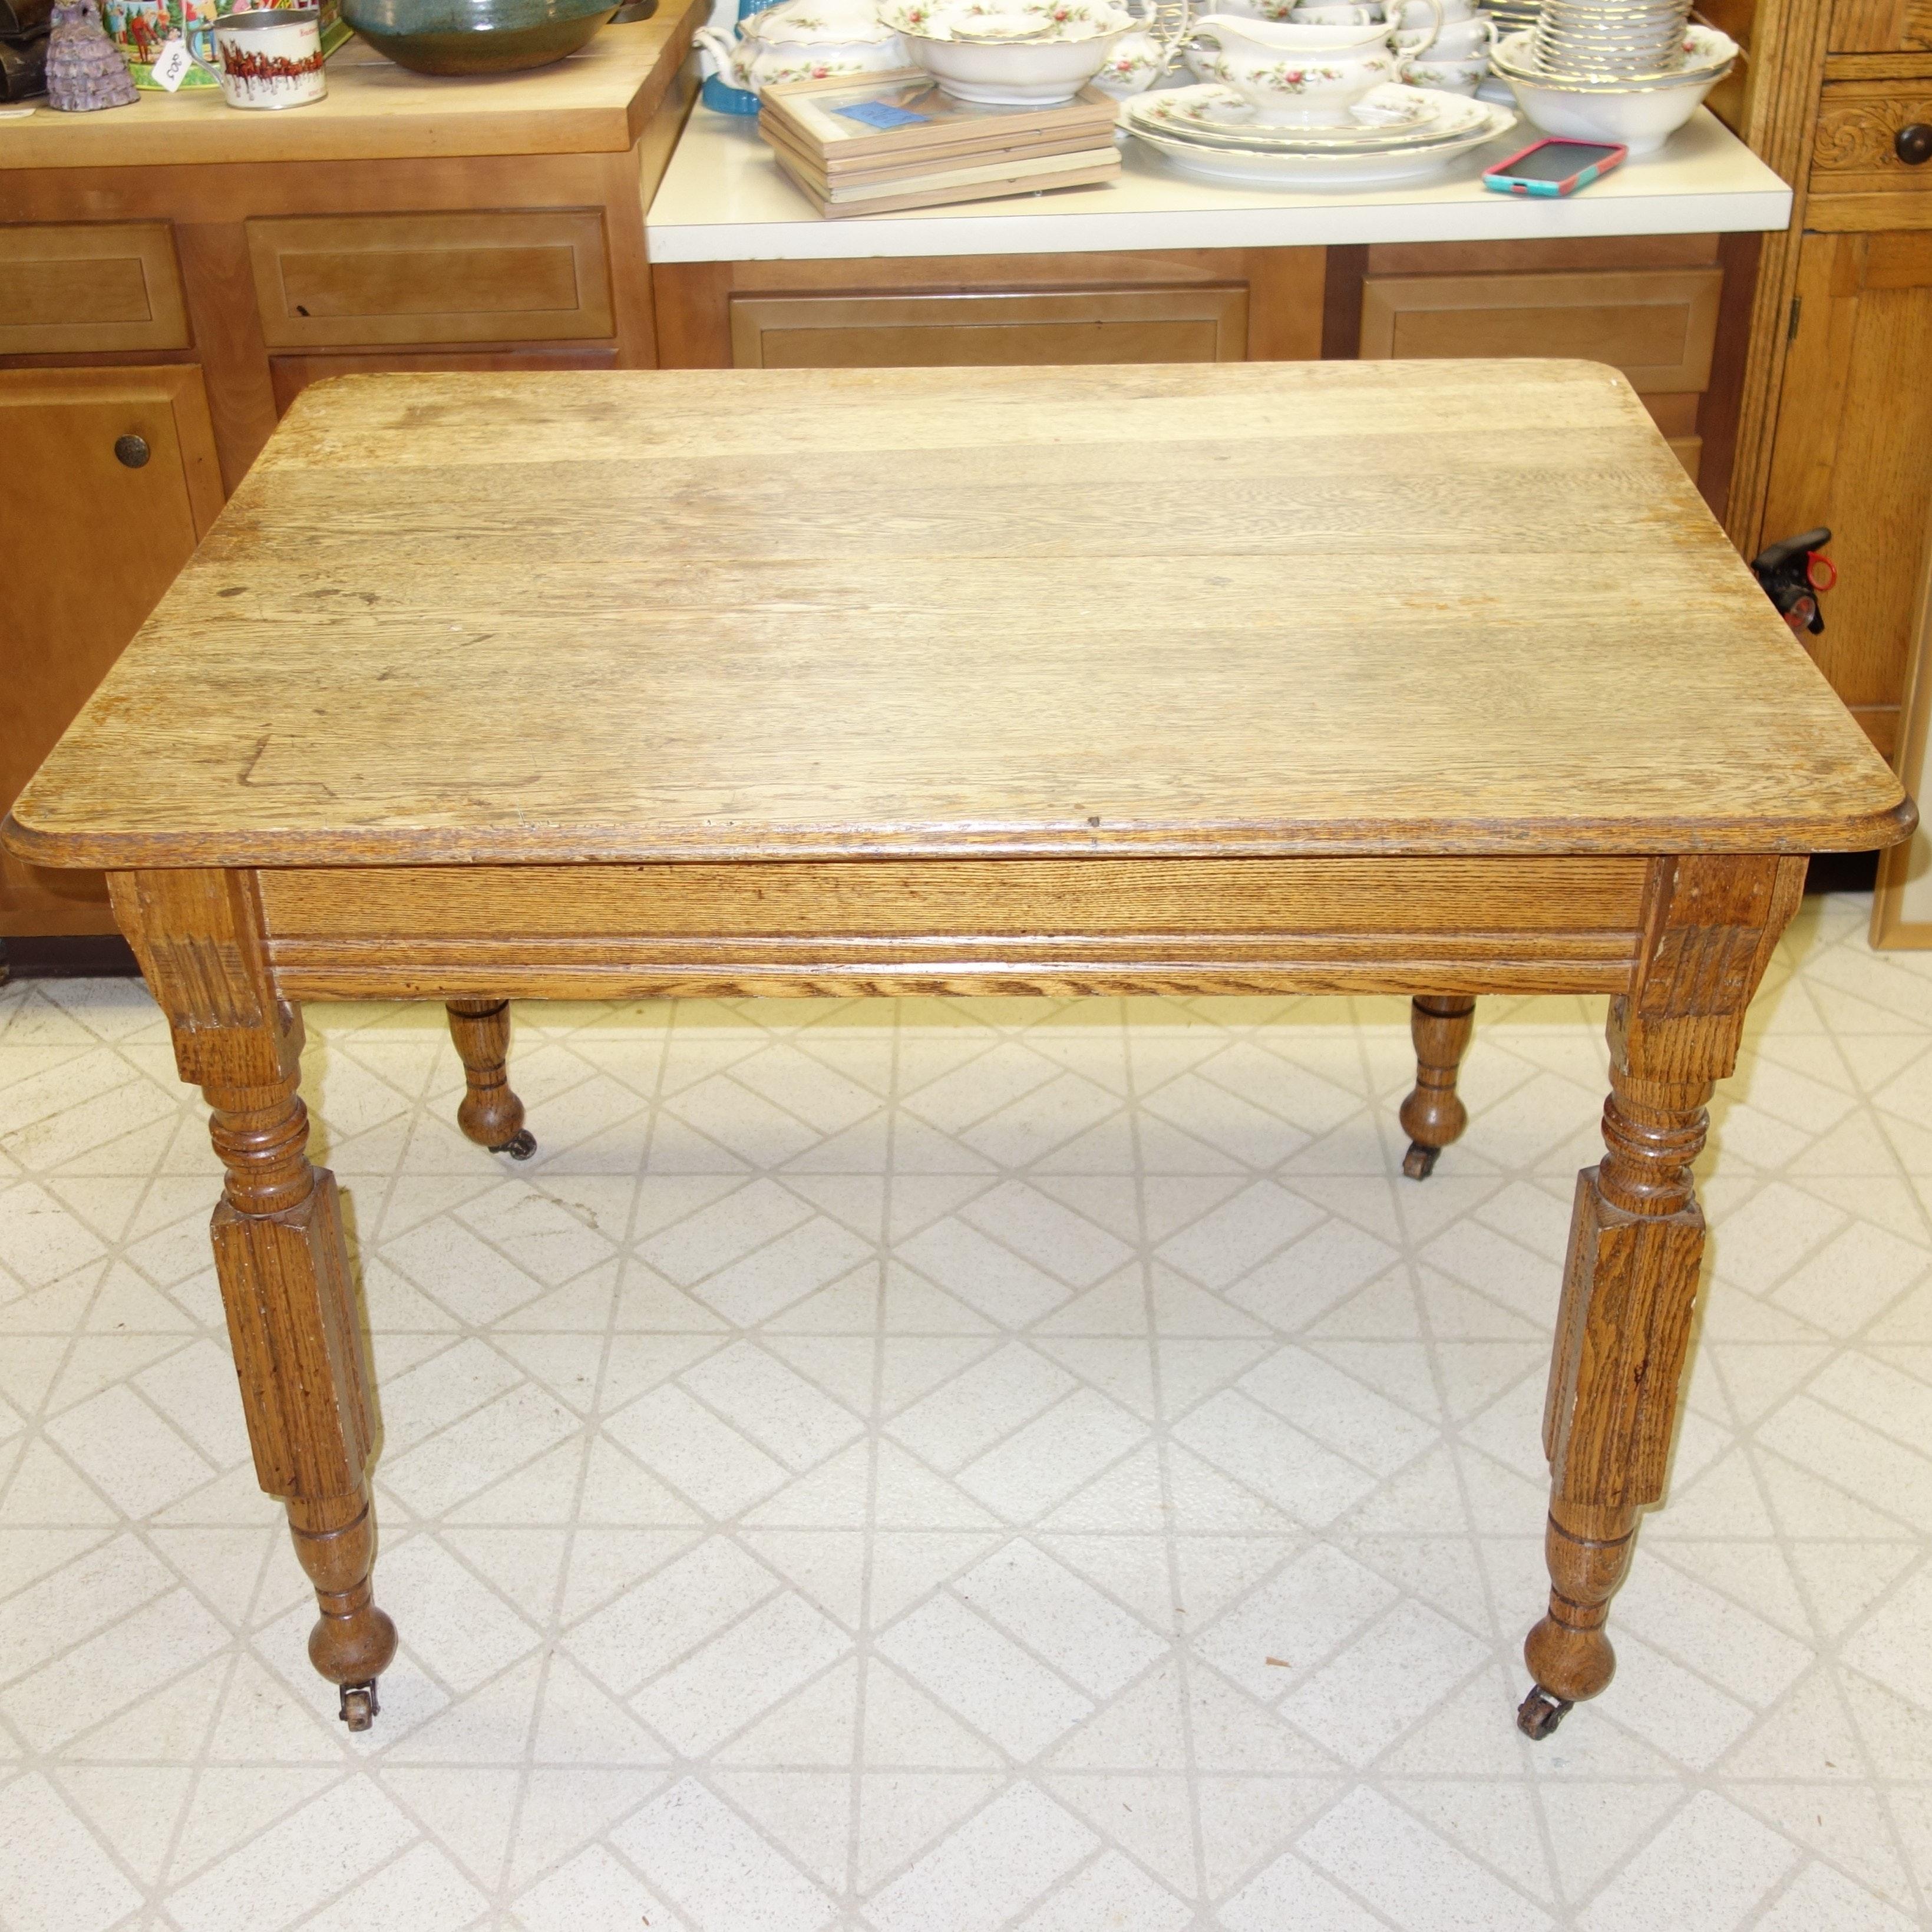 Antique Quarter Sawn Utility Table